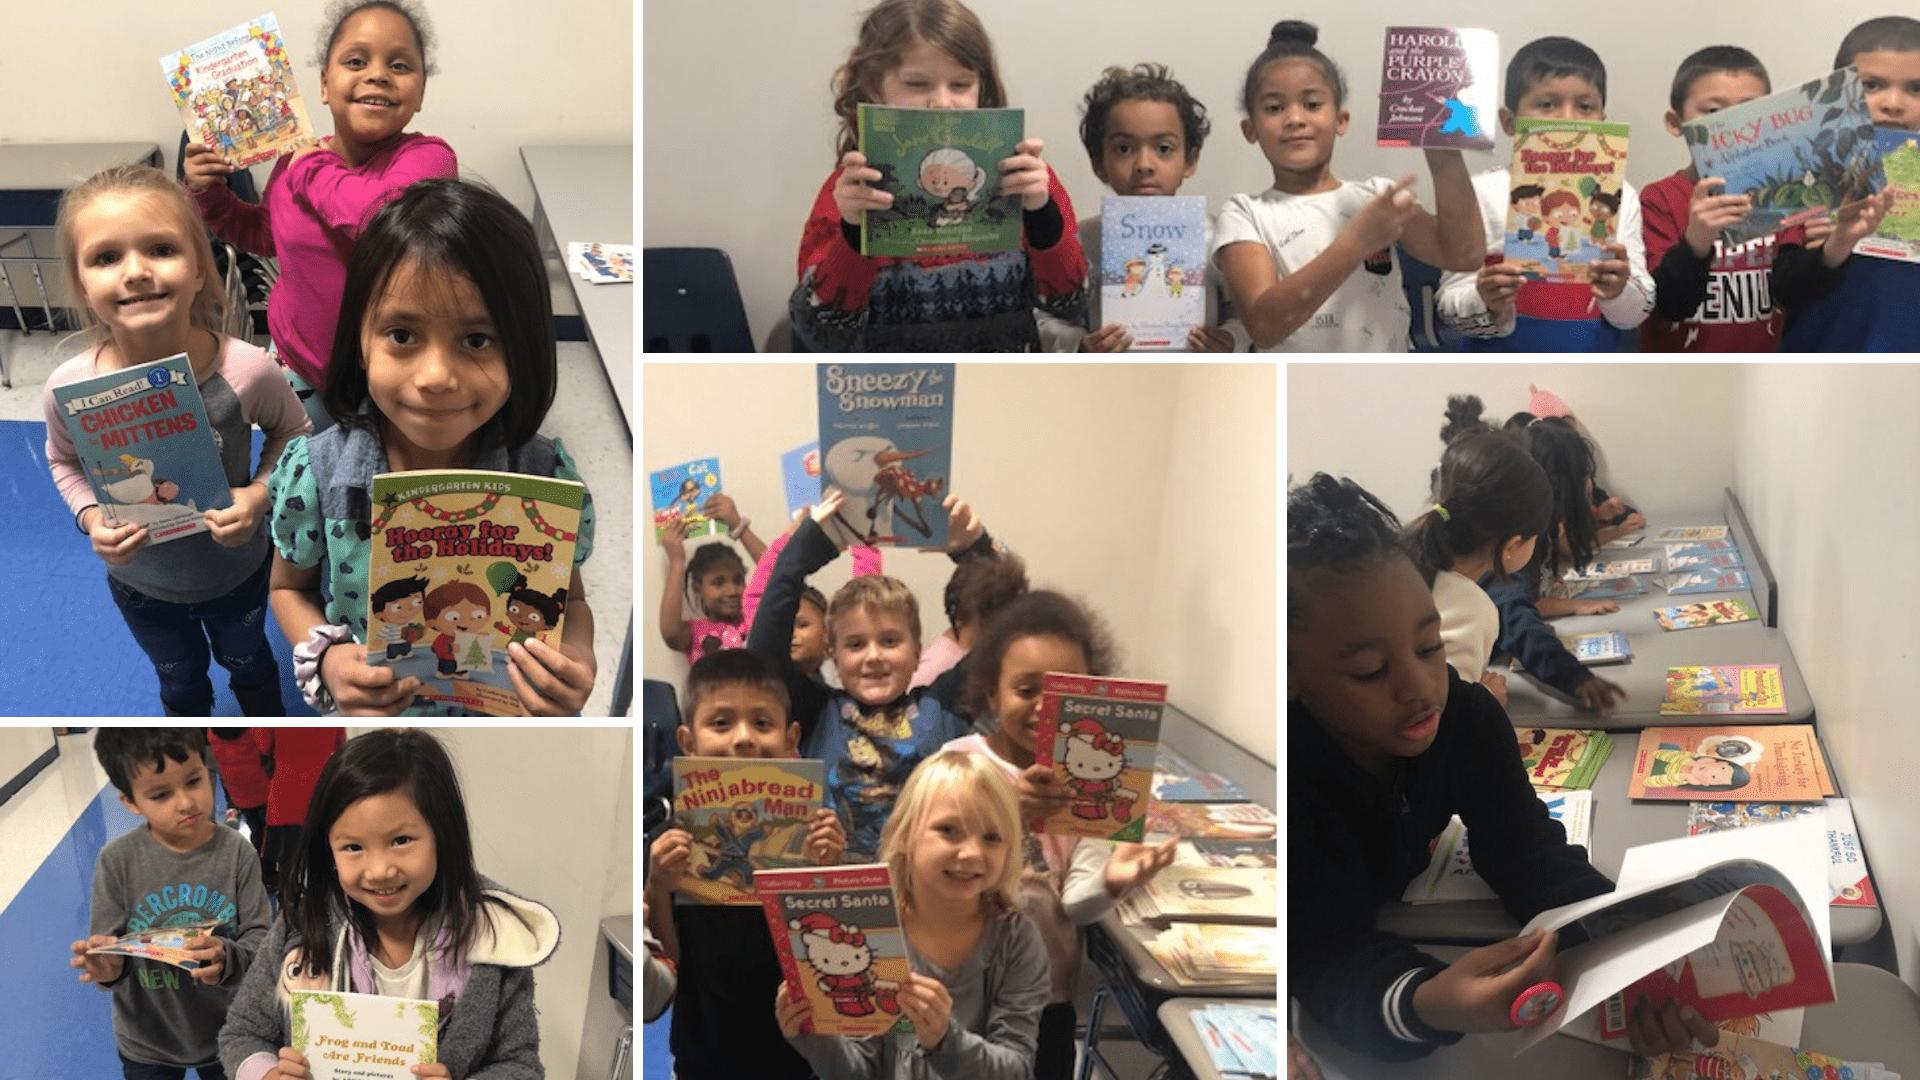 kids holding books photo grid